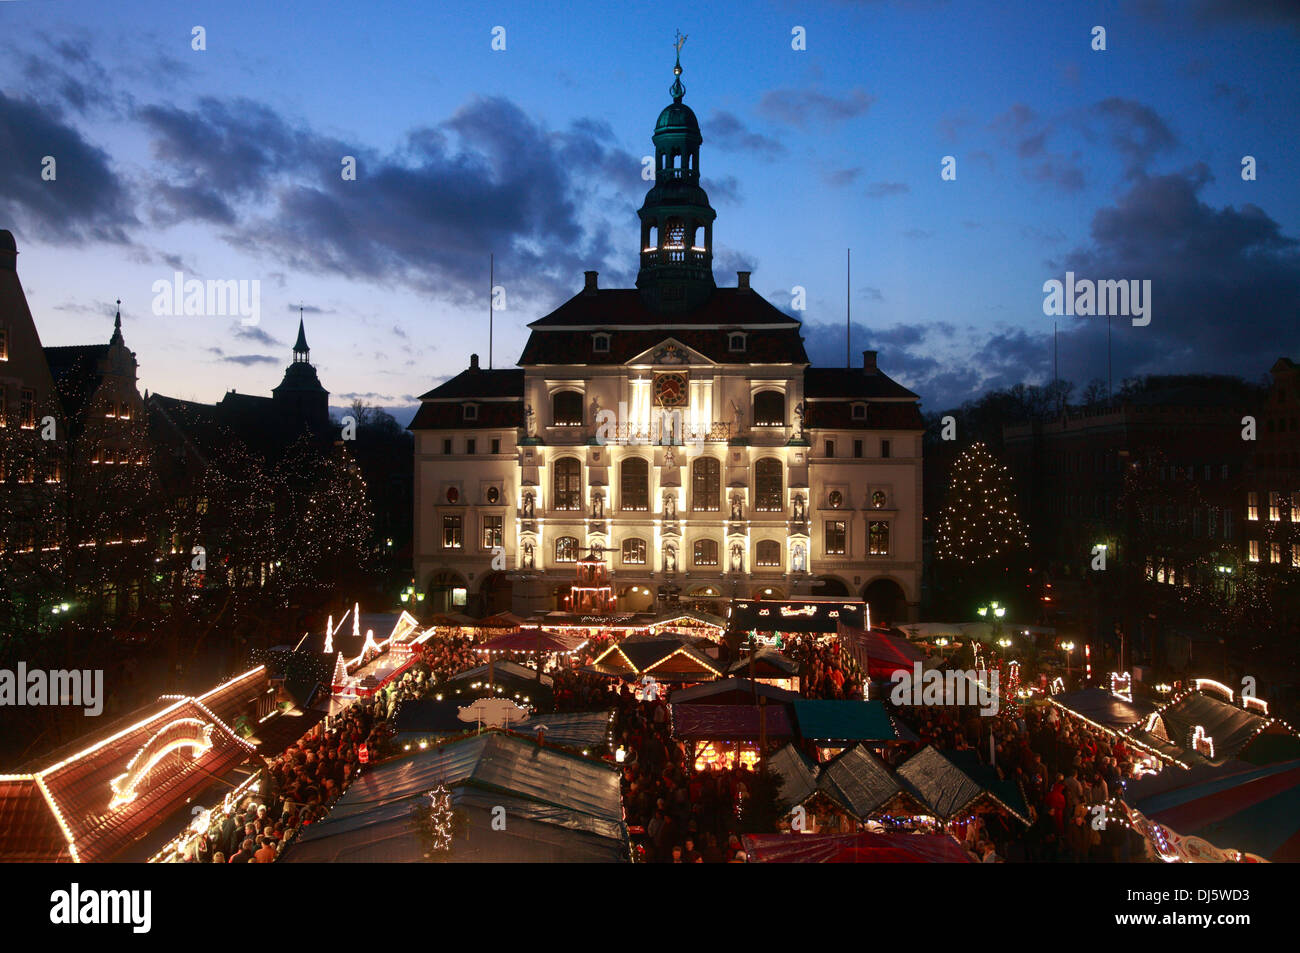 Christmas market infront of town hall, Lueneburg, Lüneburg, Lower Saxony, Germany Stock Photo